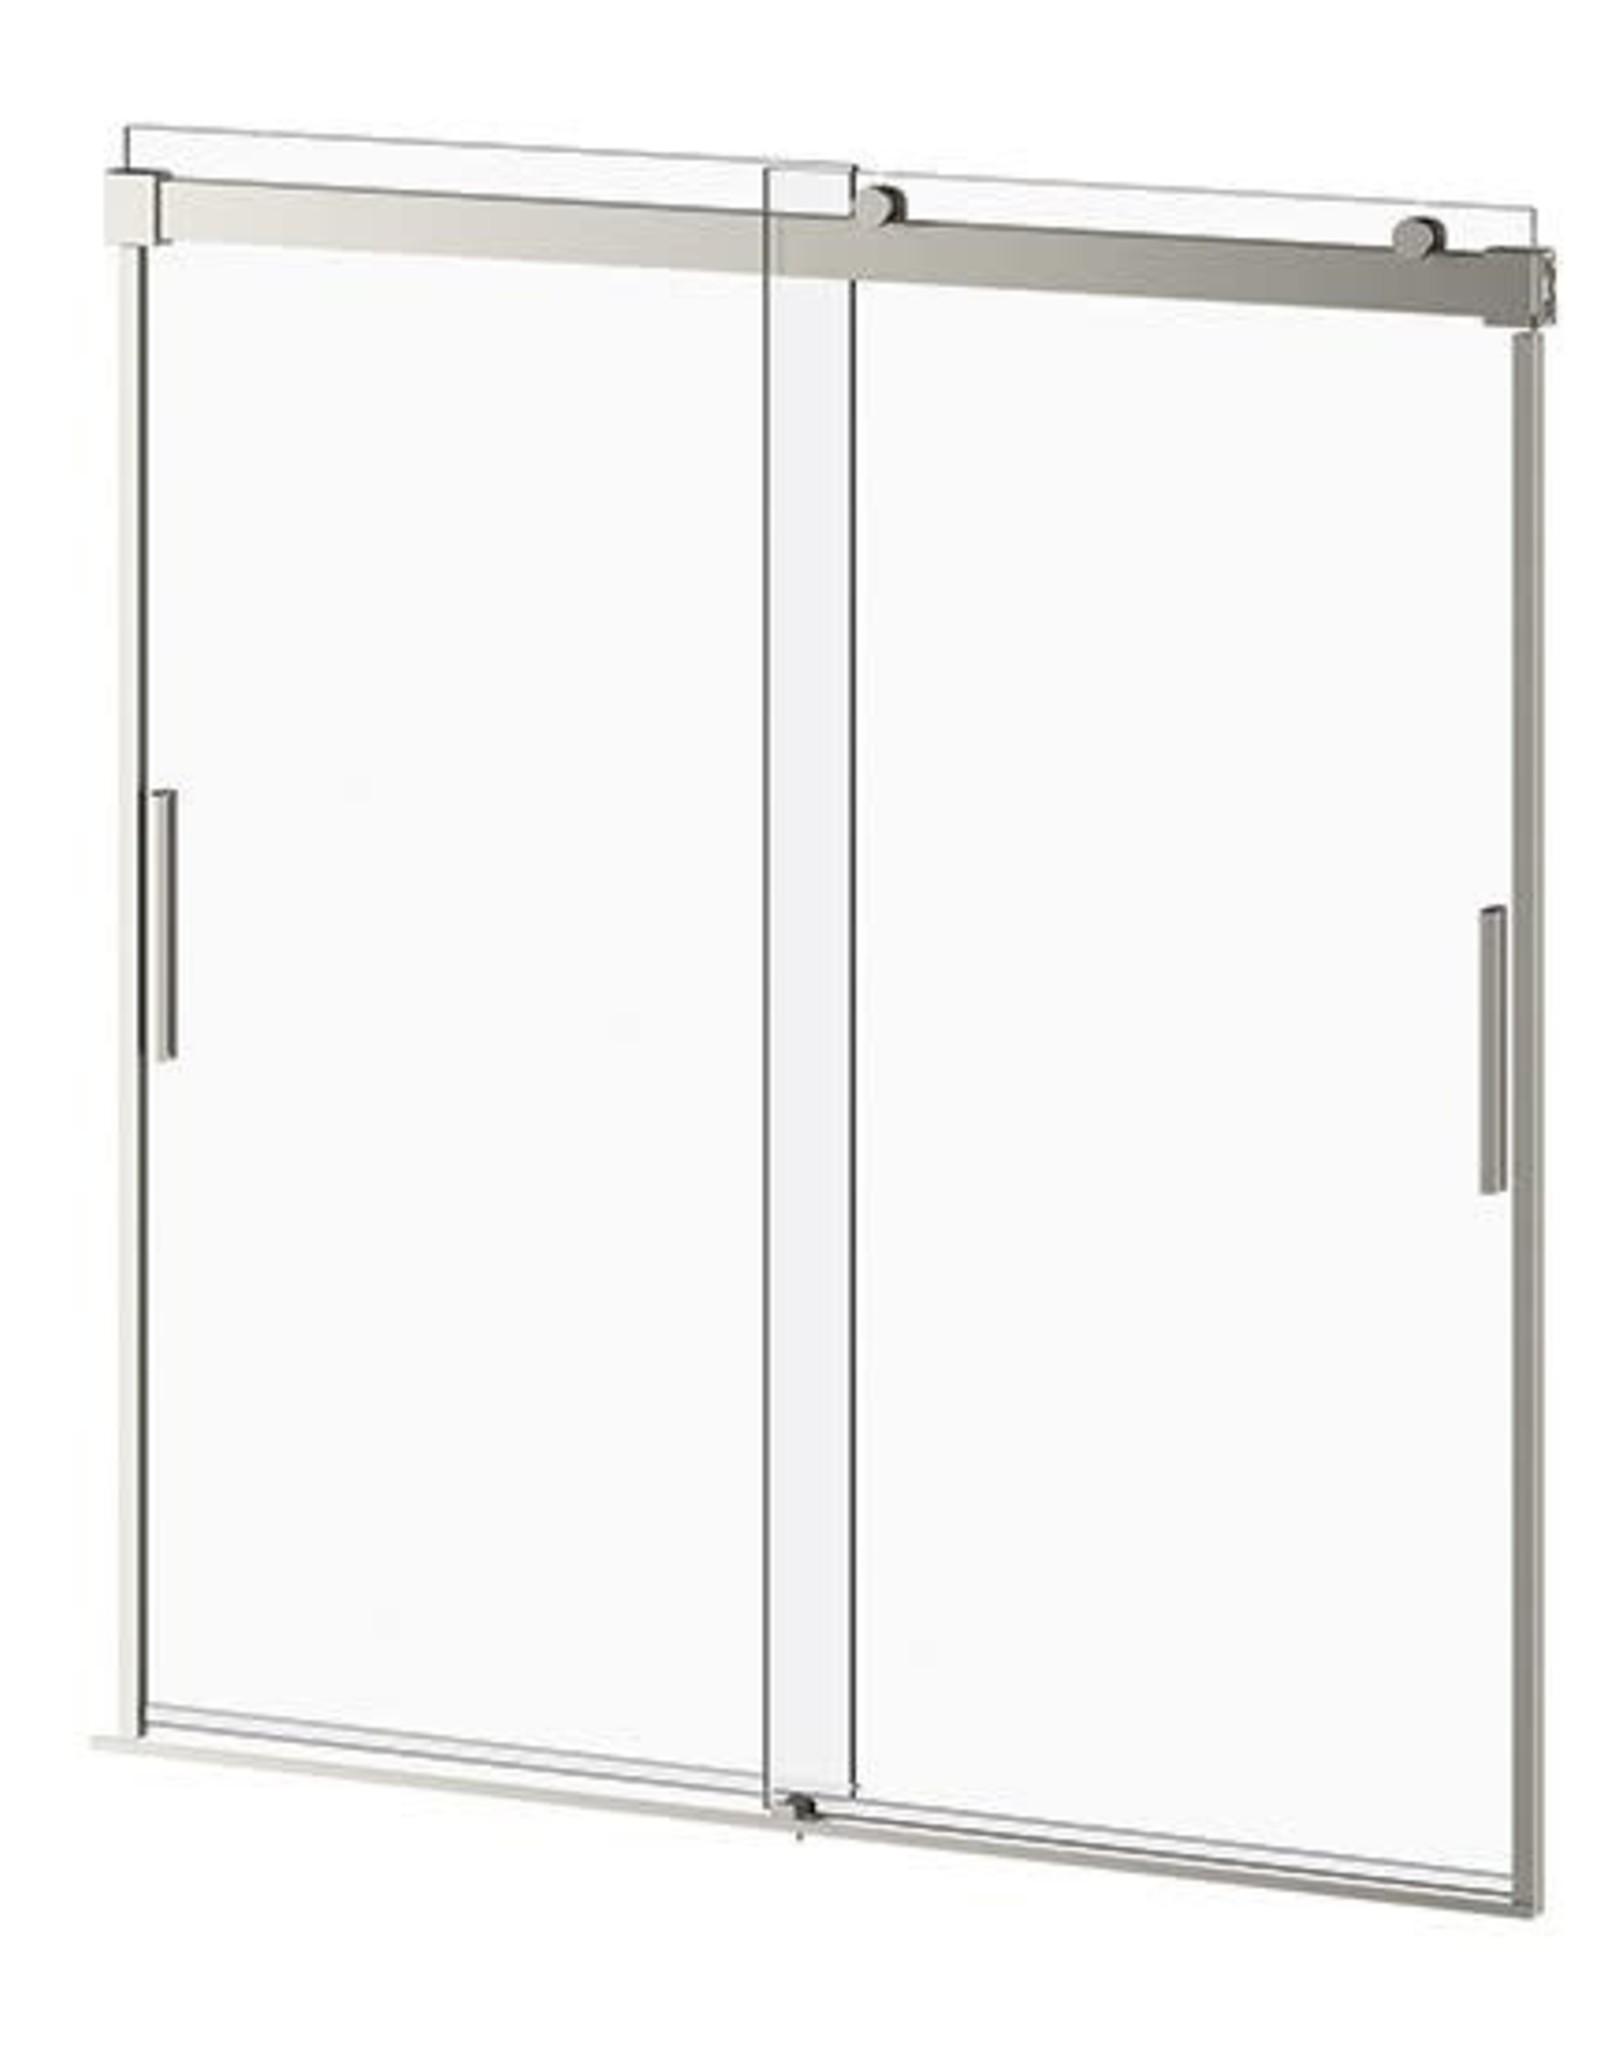 "Kalia Akcess 60"" Alcove Standard Tub Door PLUS- Brushed Nickel"